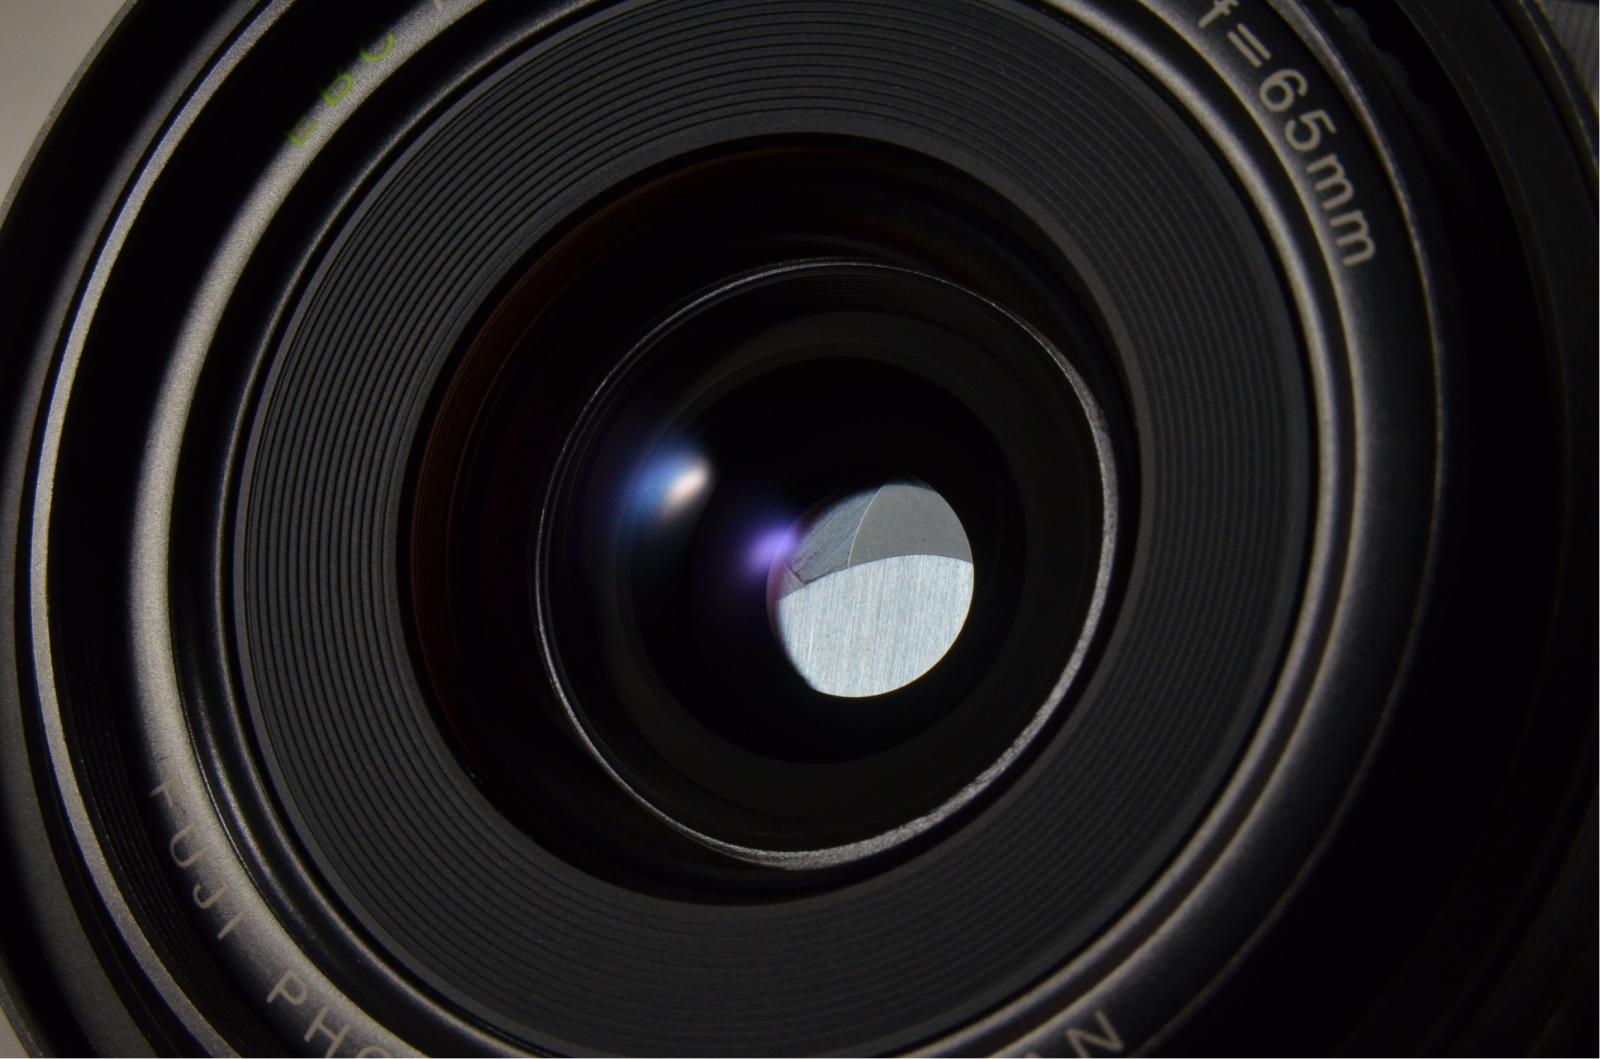 fujifilm gsw690 iii professional ebc 65mm f5.6